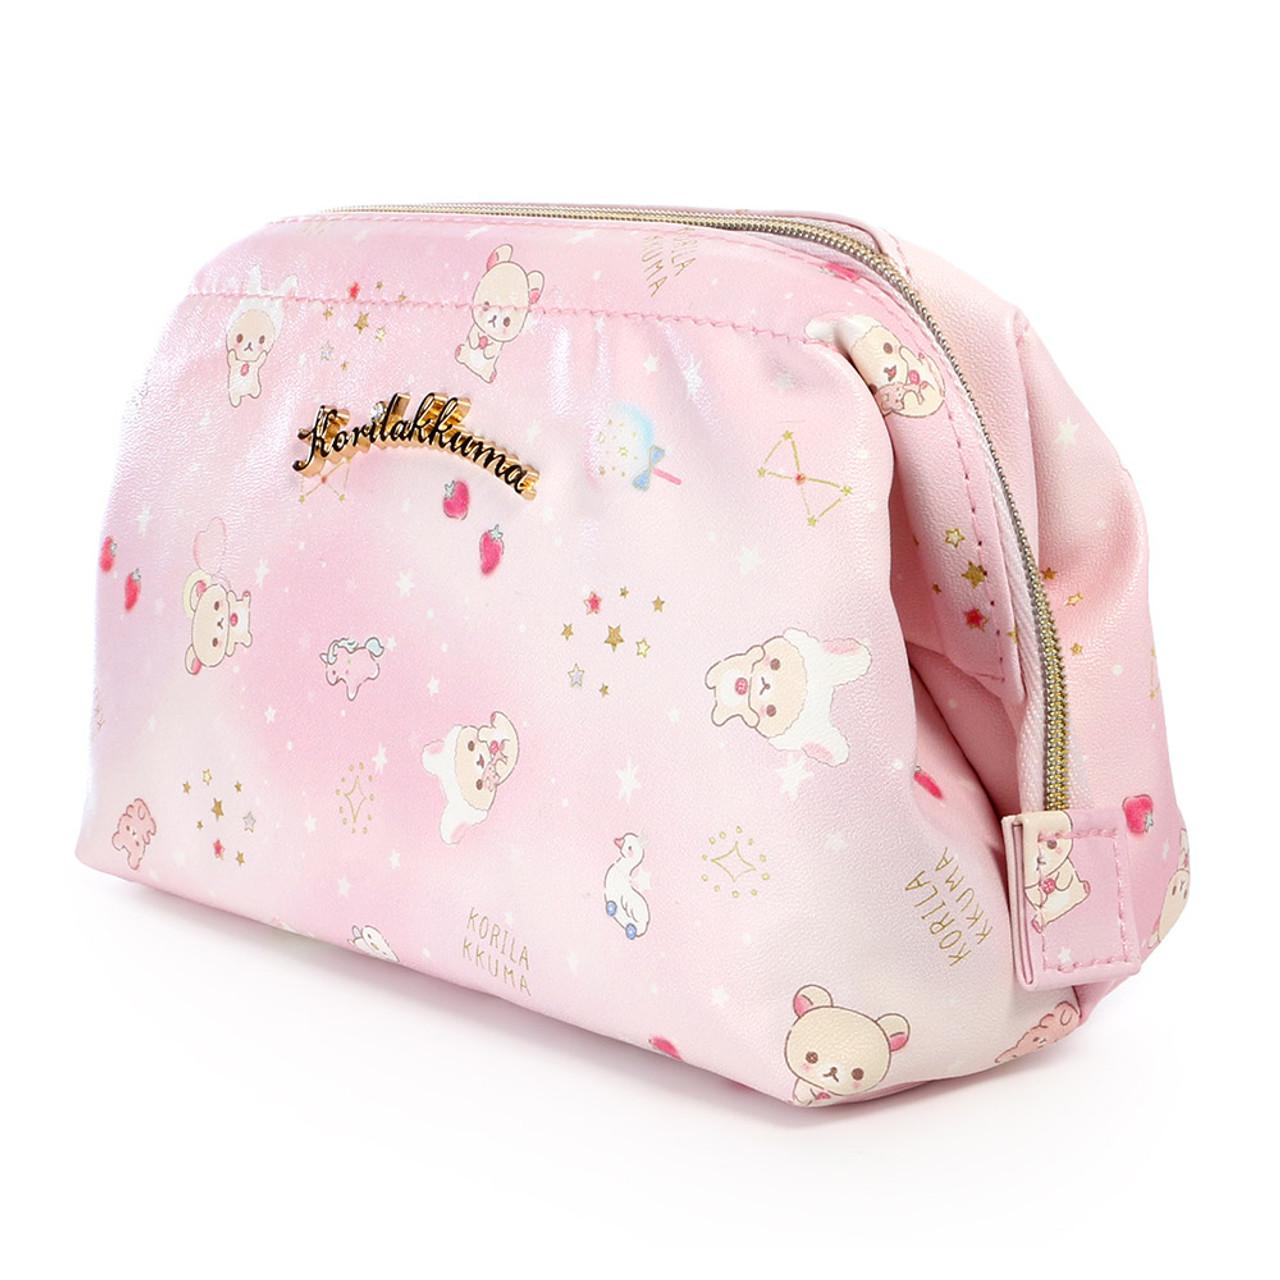 Korilakkuma Pink Fantasty Dream Cosmetic Bag ( Side View )